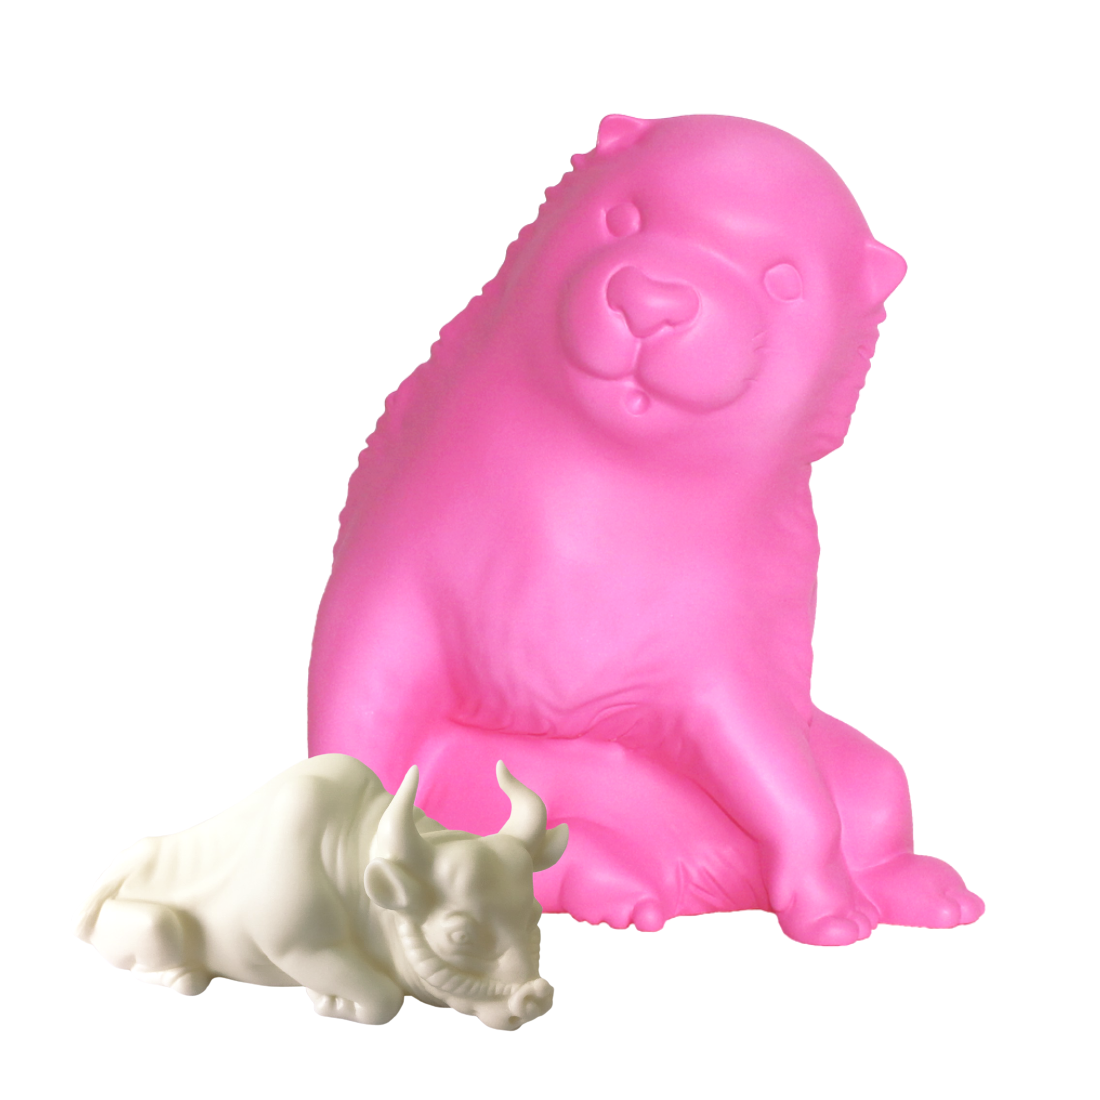 WAZURI -犬- パステルカラー【ピンク】